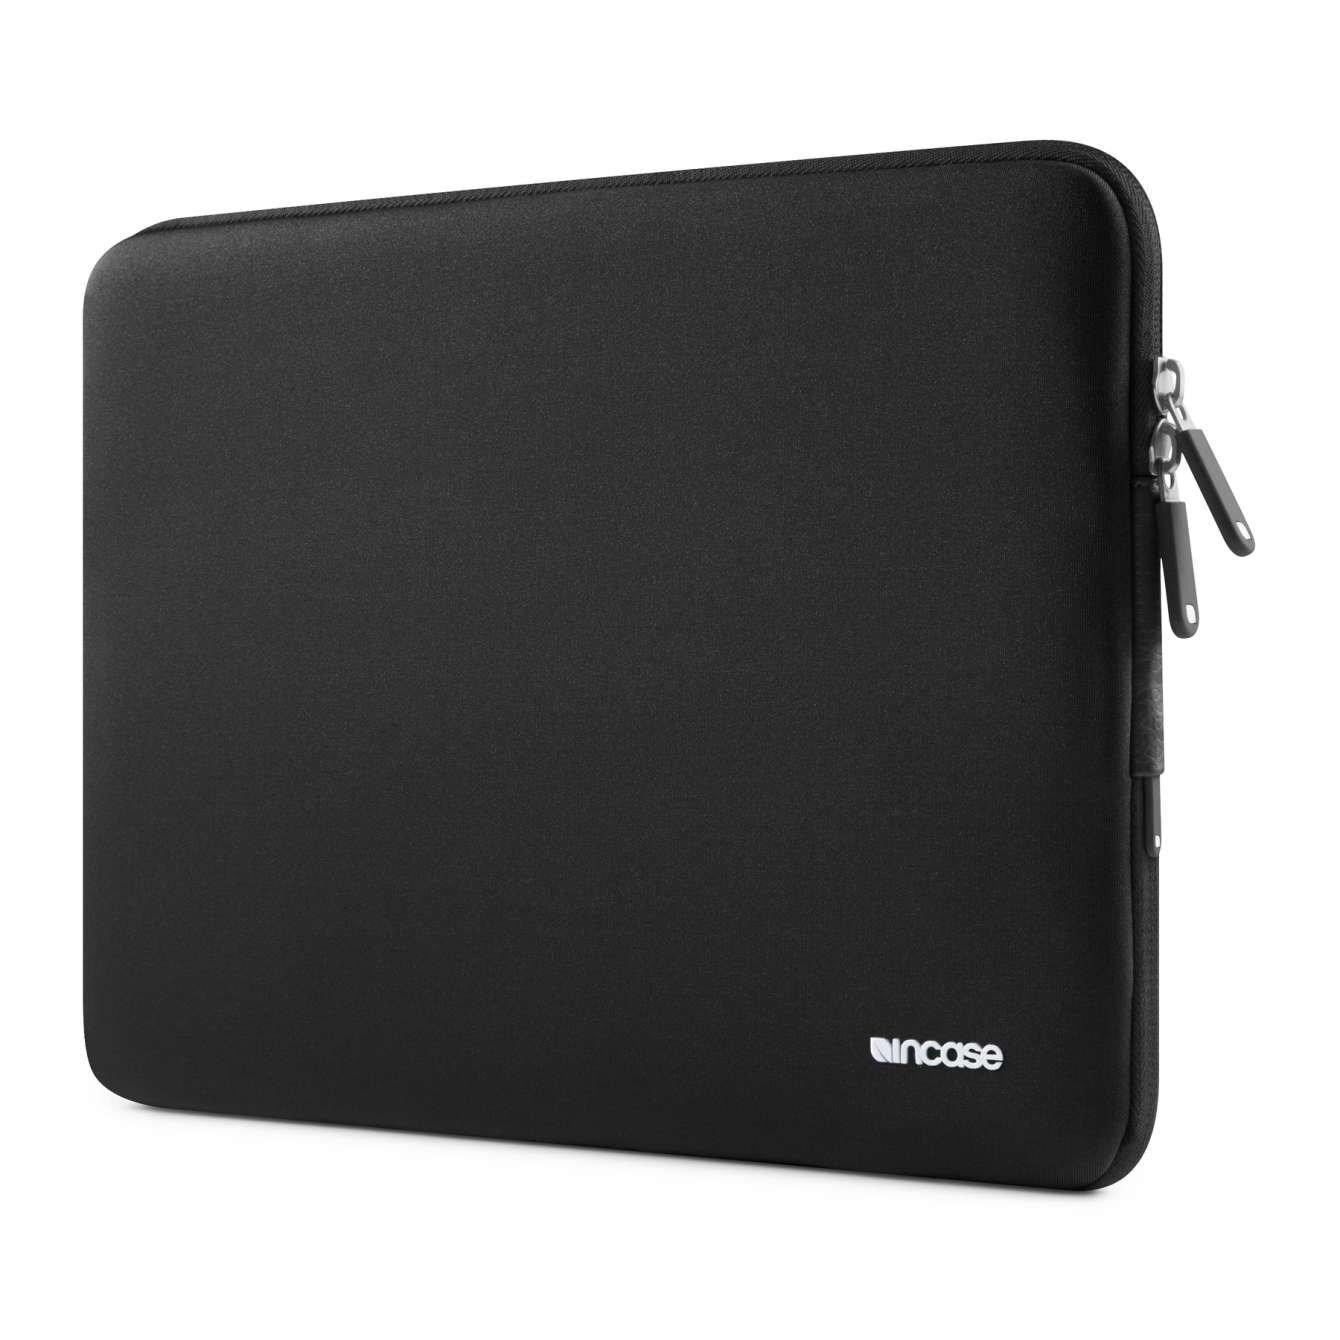 Incase Laptop Sleeve